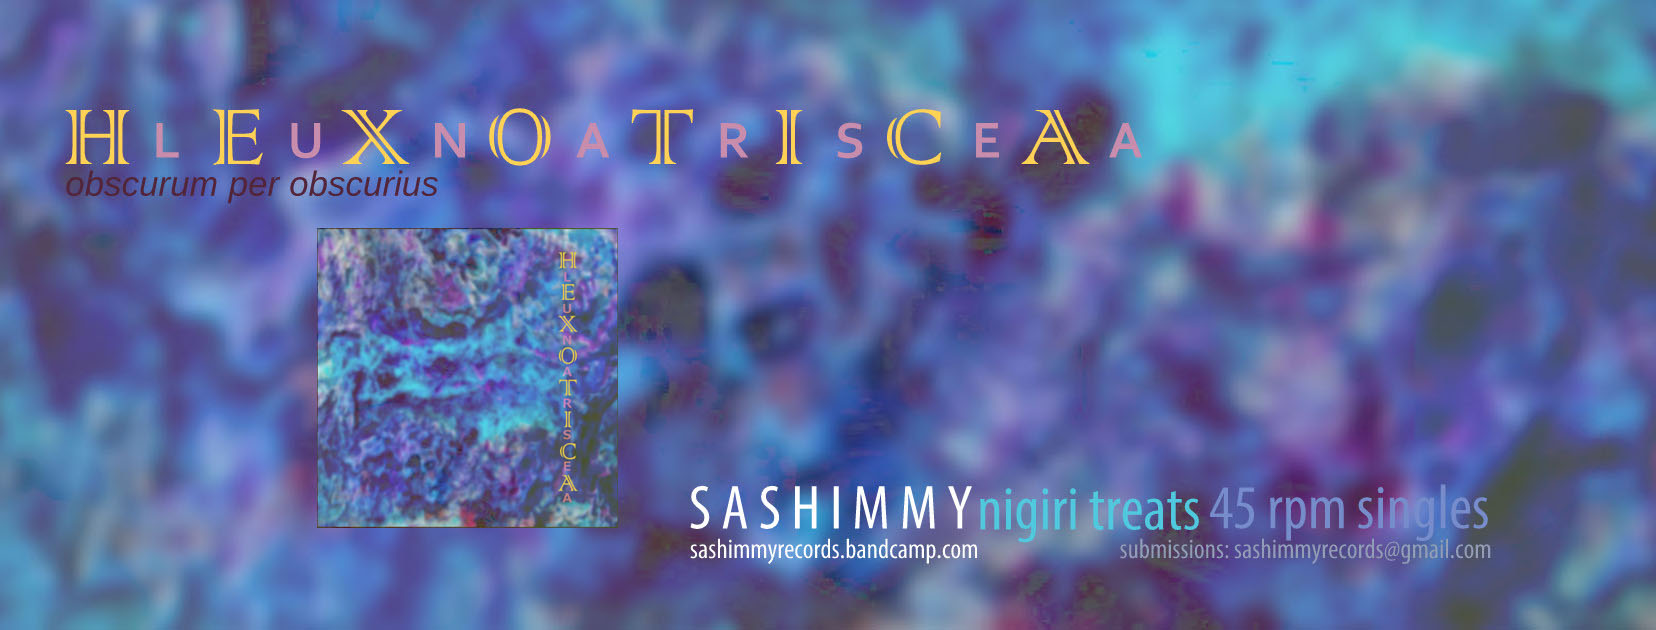 """Lunar Sea/obscurum per obscurius""- Hexotica, [Sushi_018], released July 30, 2018. Visit  https://sashimmyrecords.bandcamp.com/"